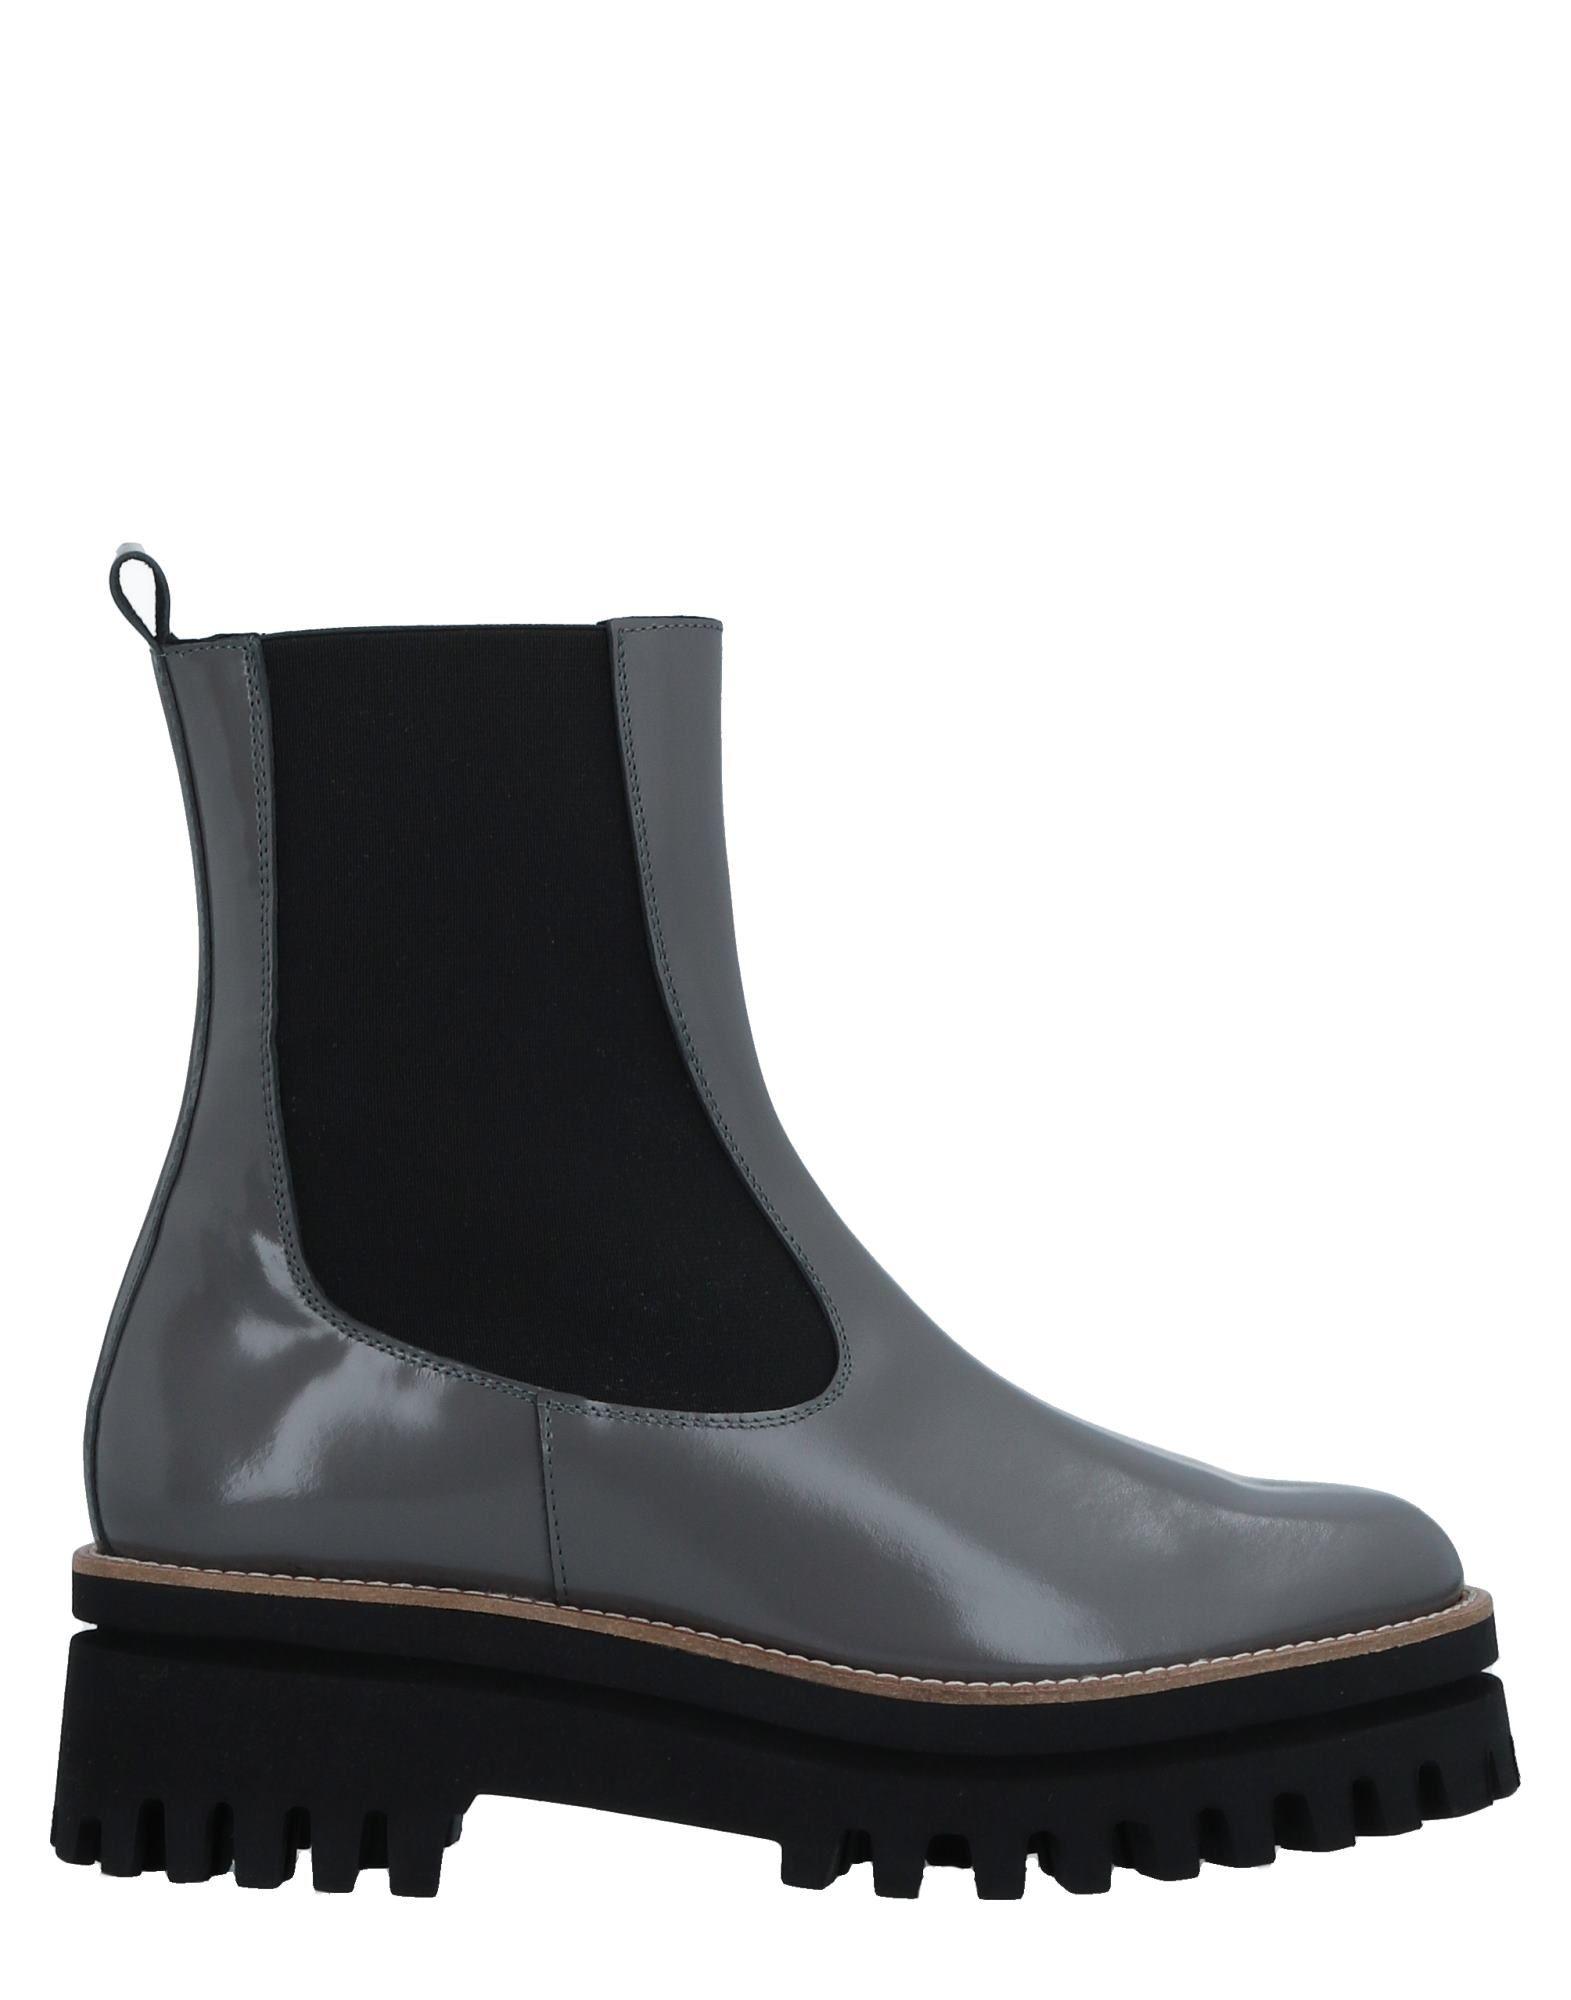 Stilvolle billige Schuhe Paloma Barceló Stiefelette Damen Damen Damen  11515865QB 37a717